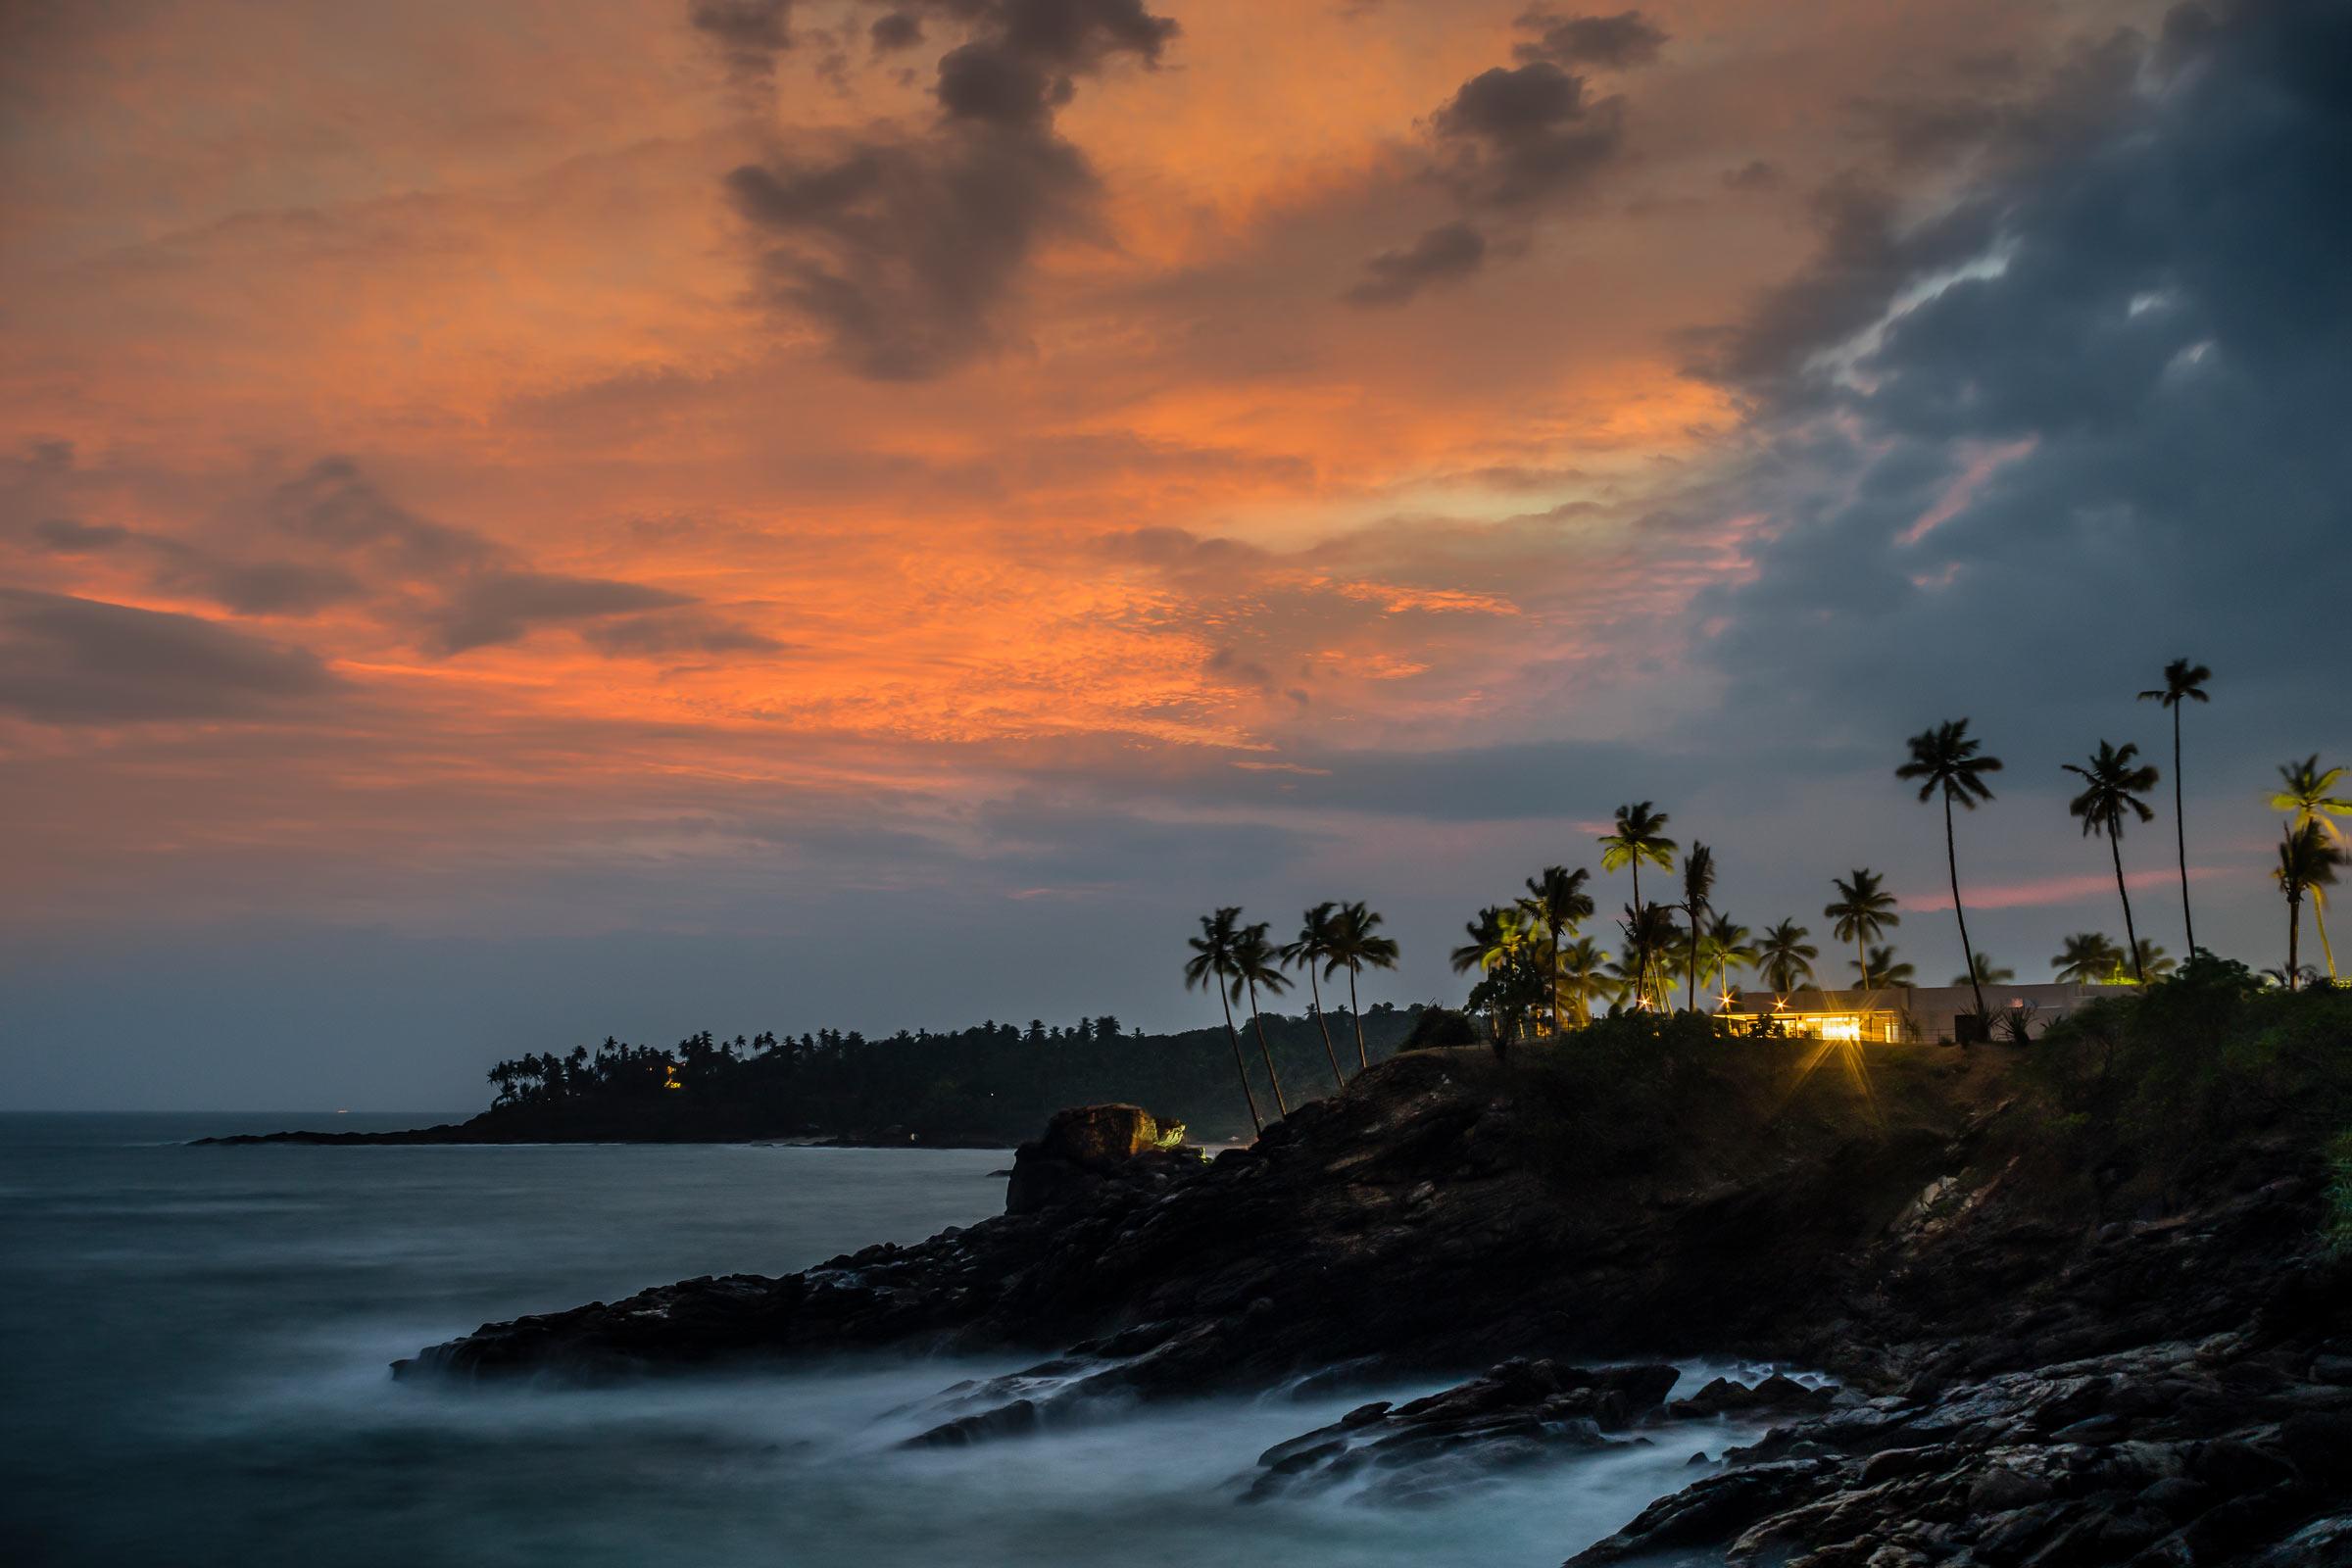 Anantara-Peace-Haven-Tangalle-Resort-_-Il-Mare_-sunset.jpg